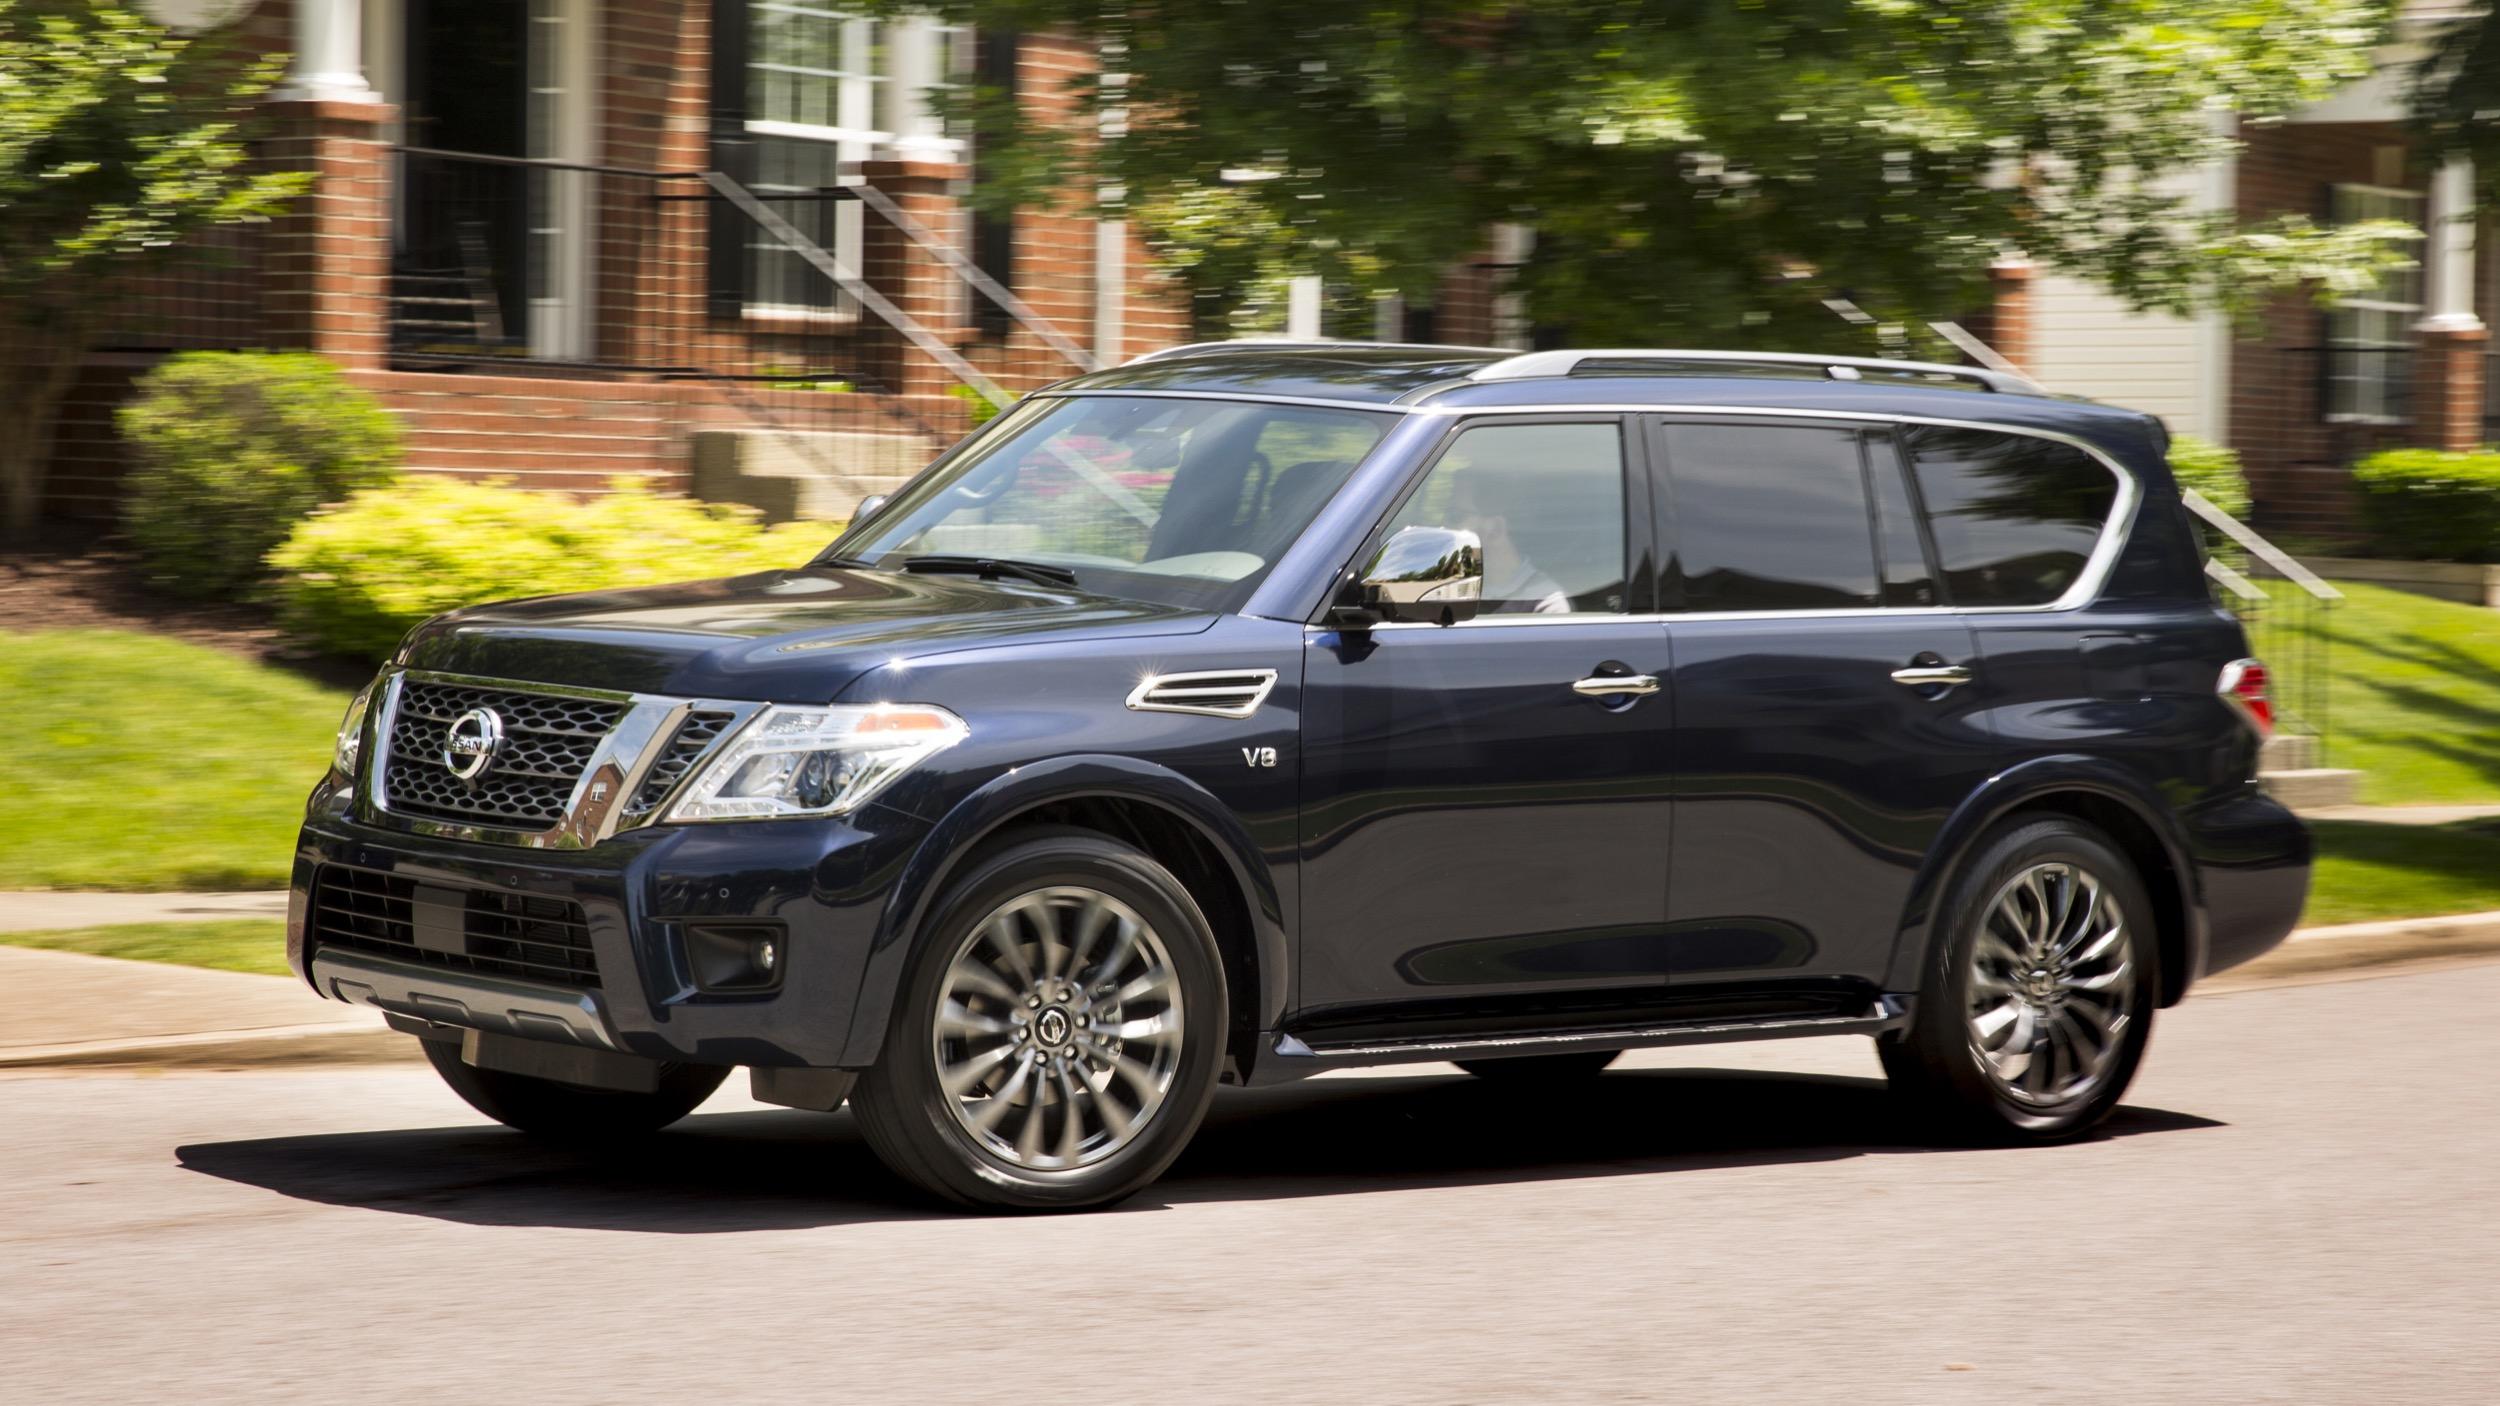 2020 Nissan Armada Reviews Price Specs Features And Photos Autoblog